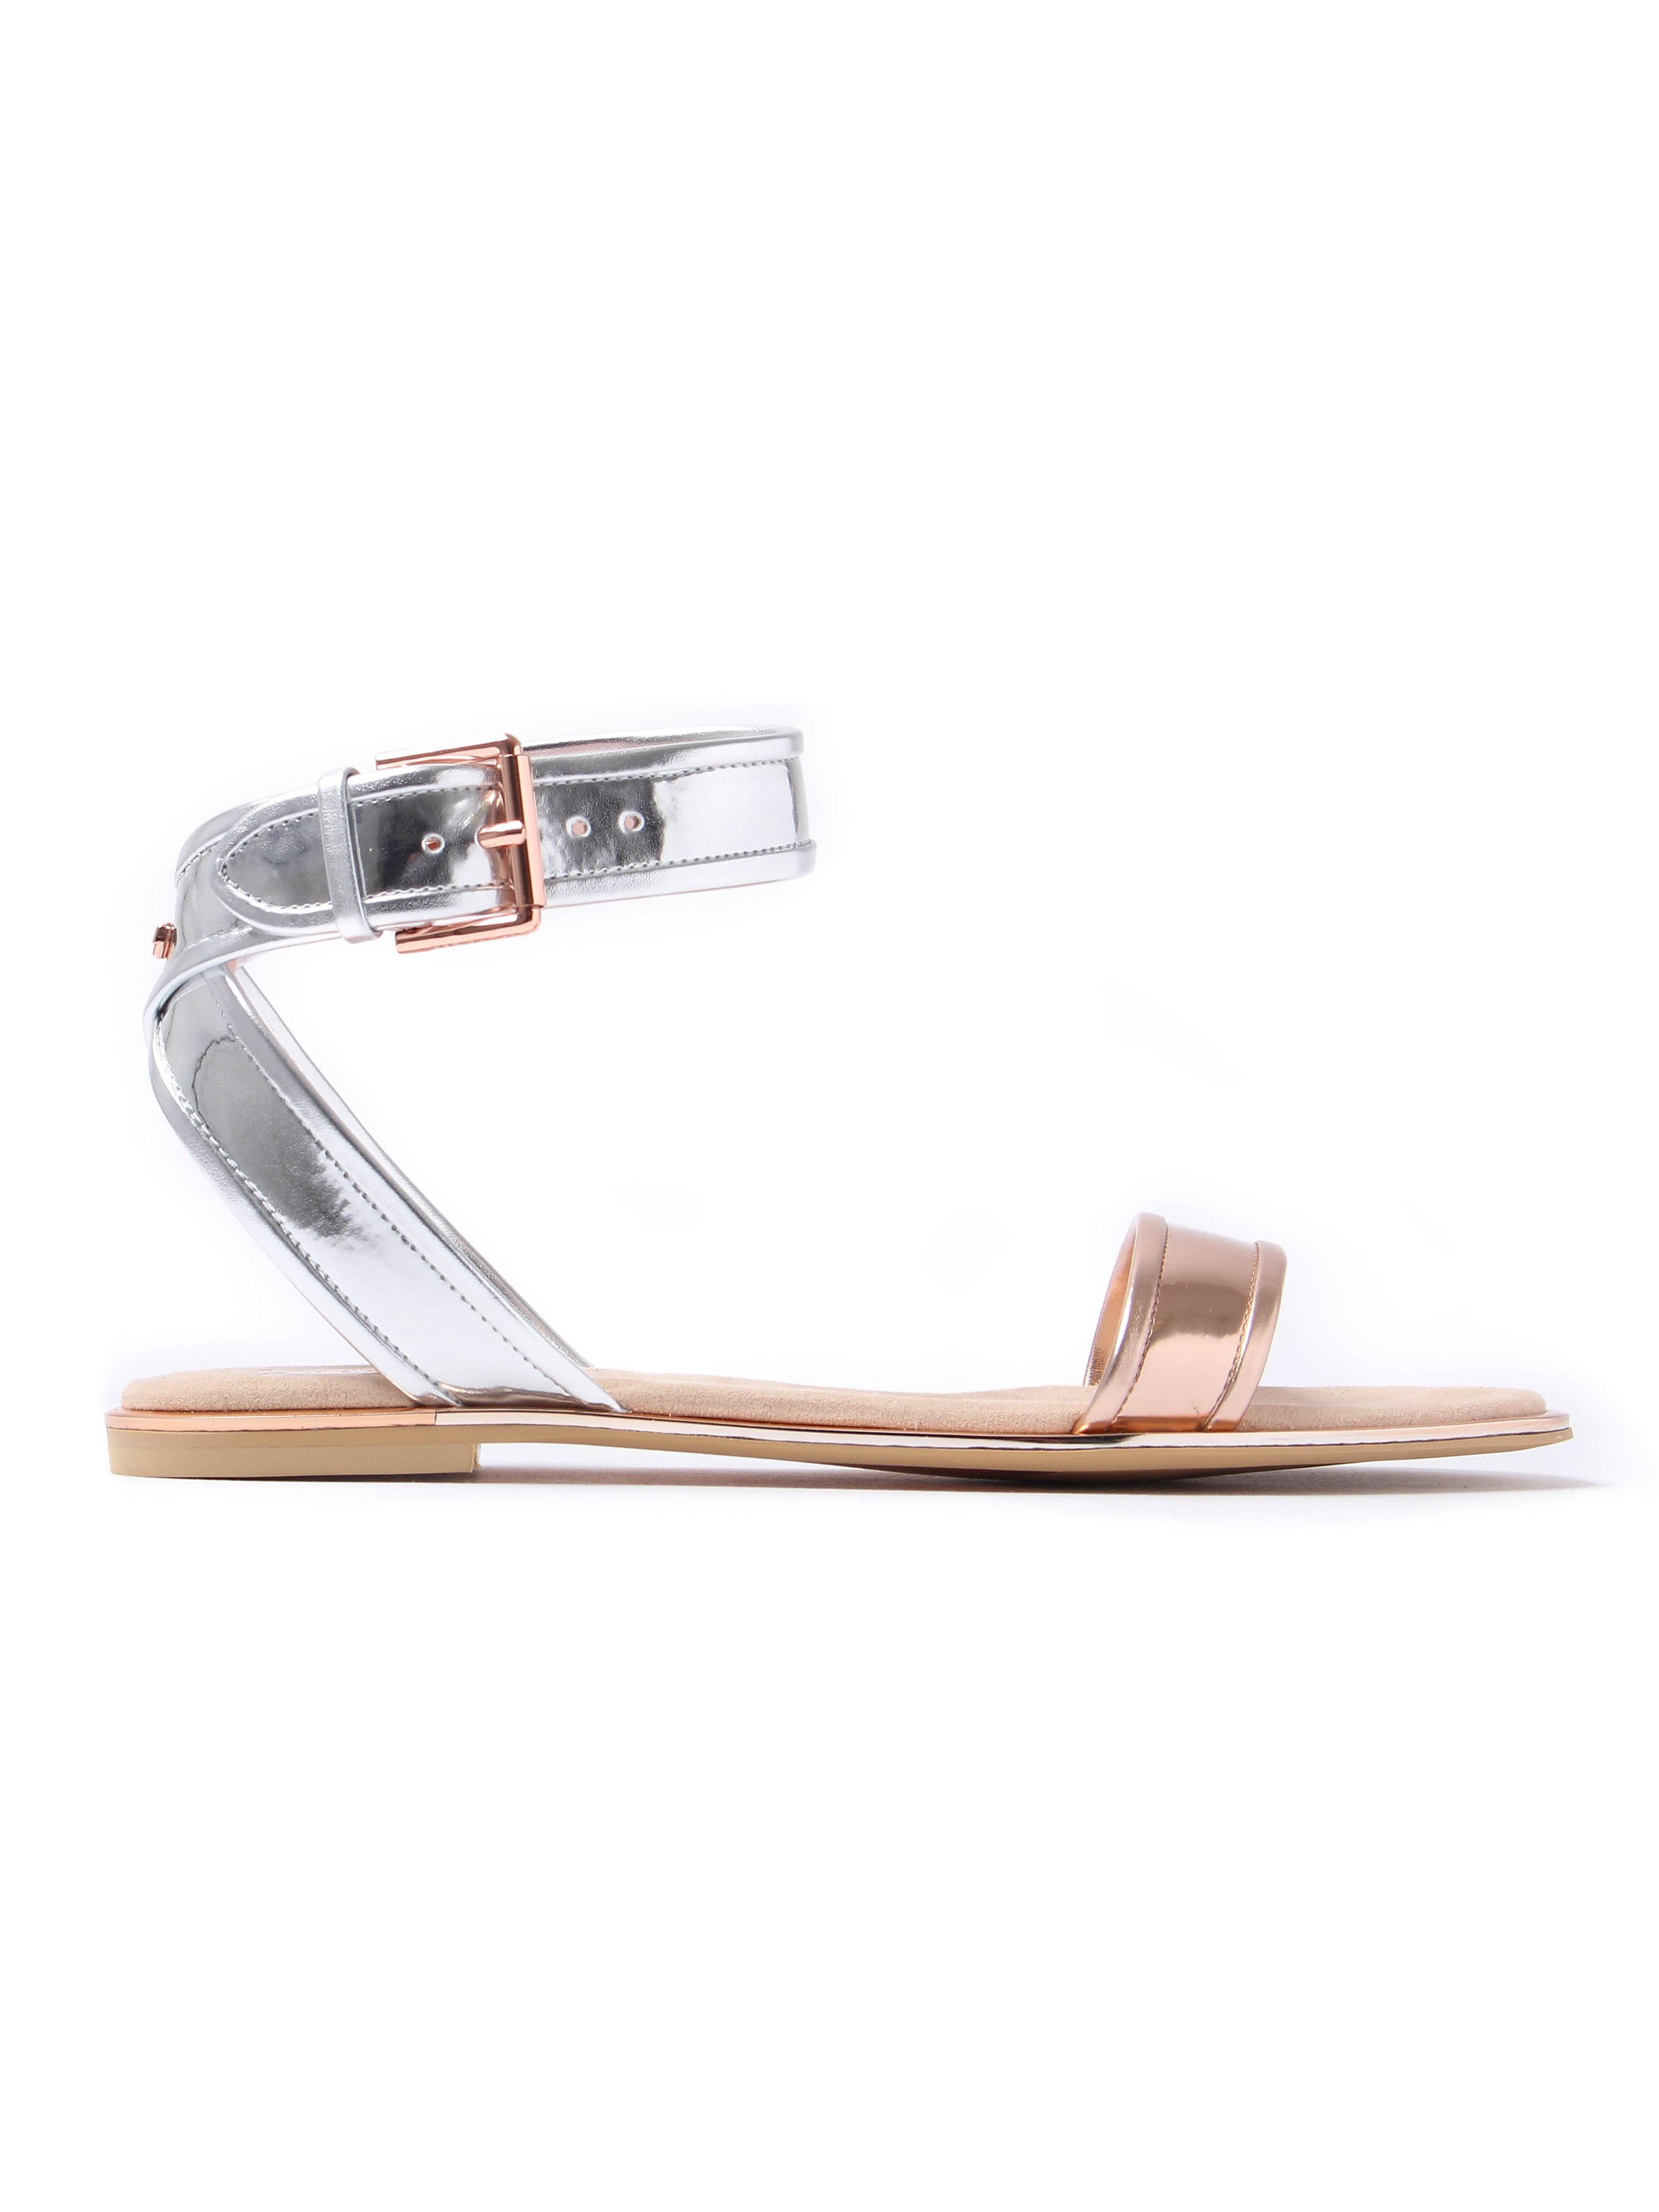 Ted Baker Women's Alella Metallic Sandals - Rose Gold & Silver